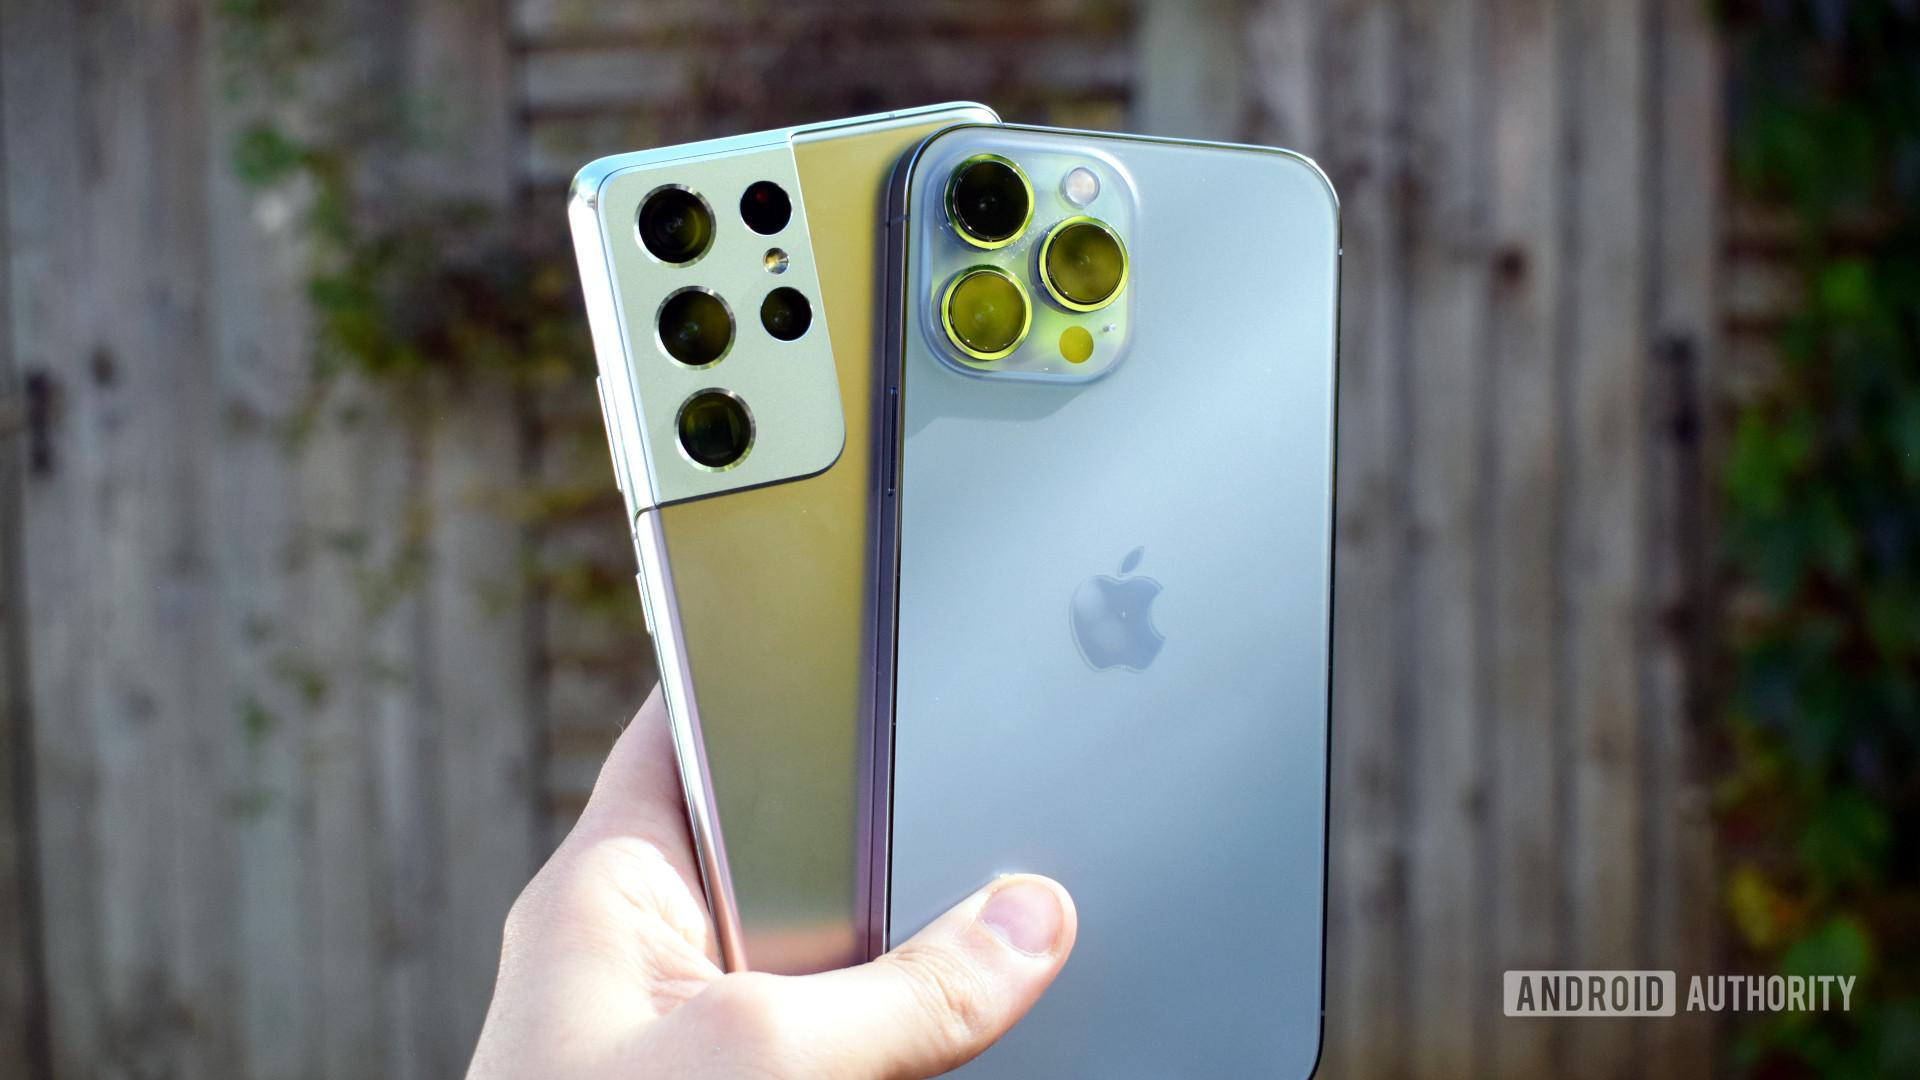 Apple iPhone 13 Pro Max vs Samsung Galaxy S21 Ultra outside